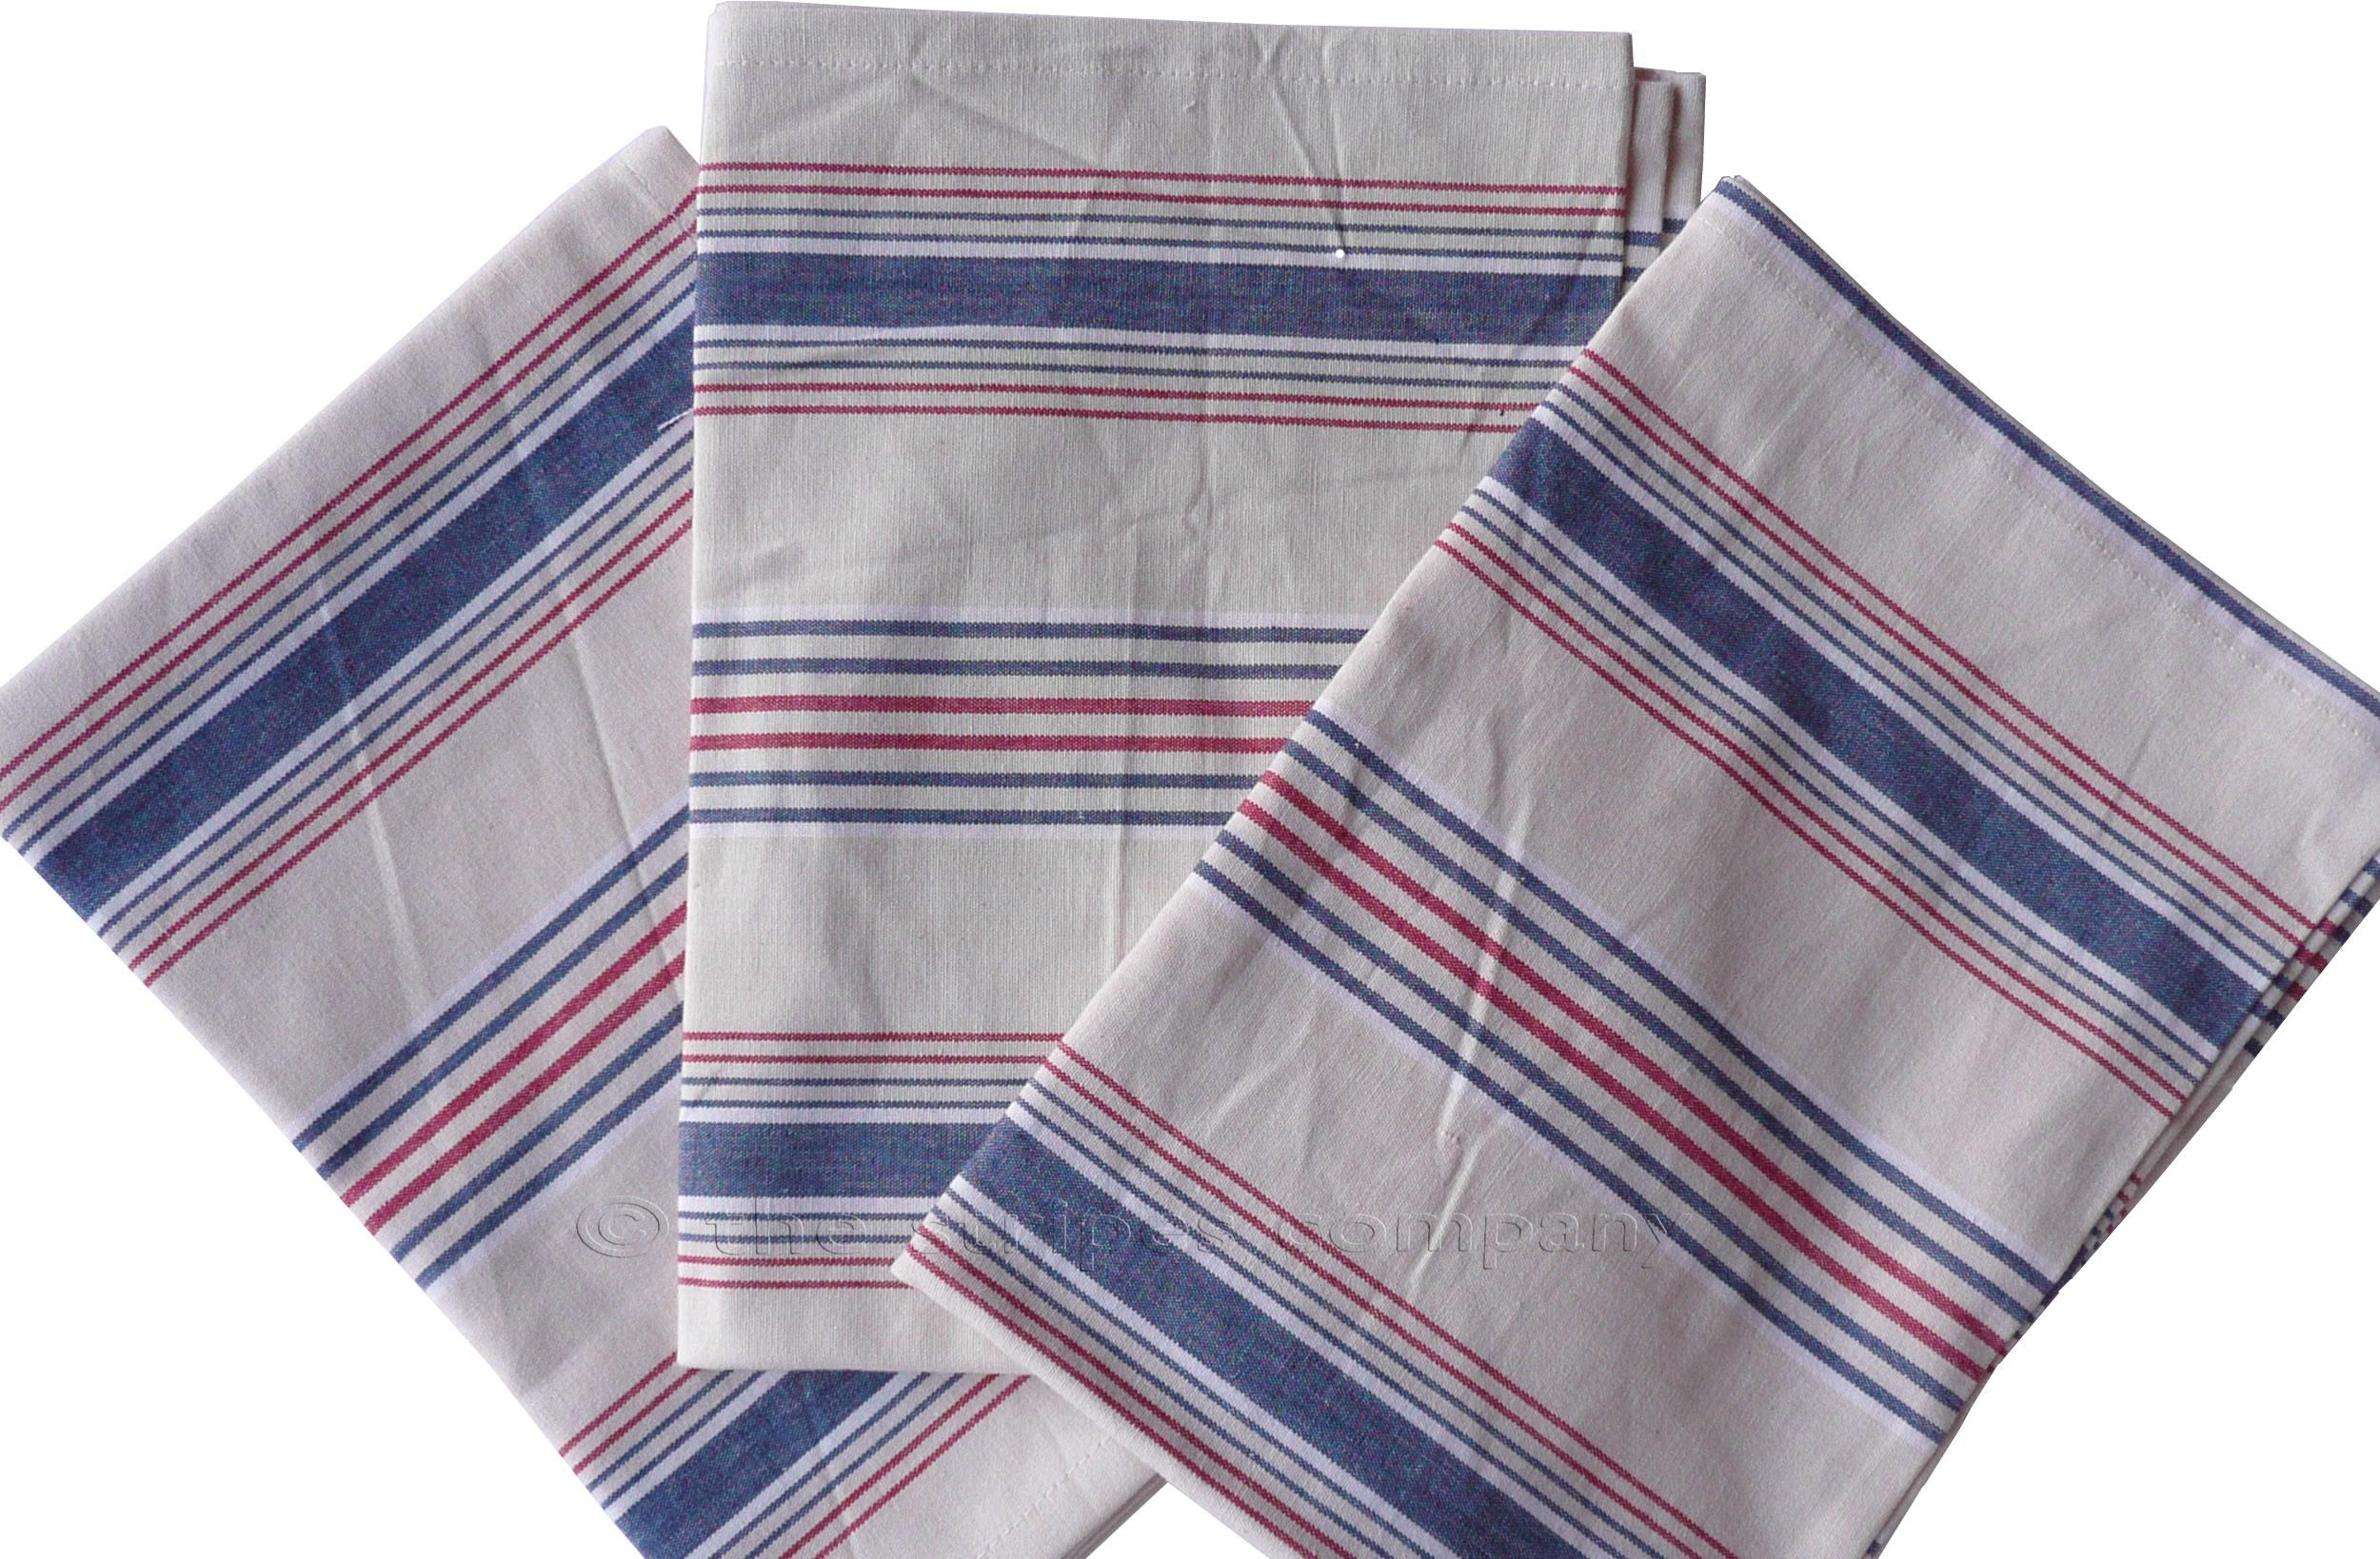 tea towel sets orienteering - Kitchen Towel Sets